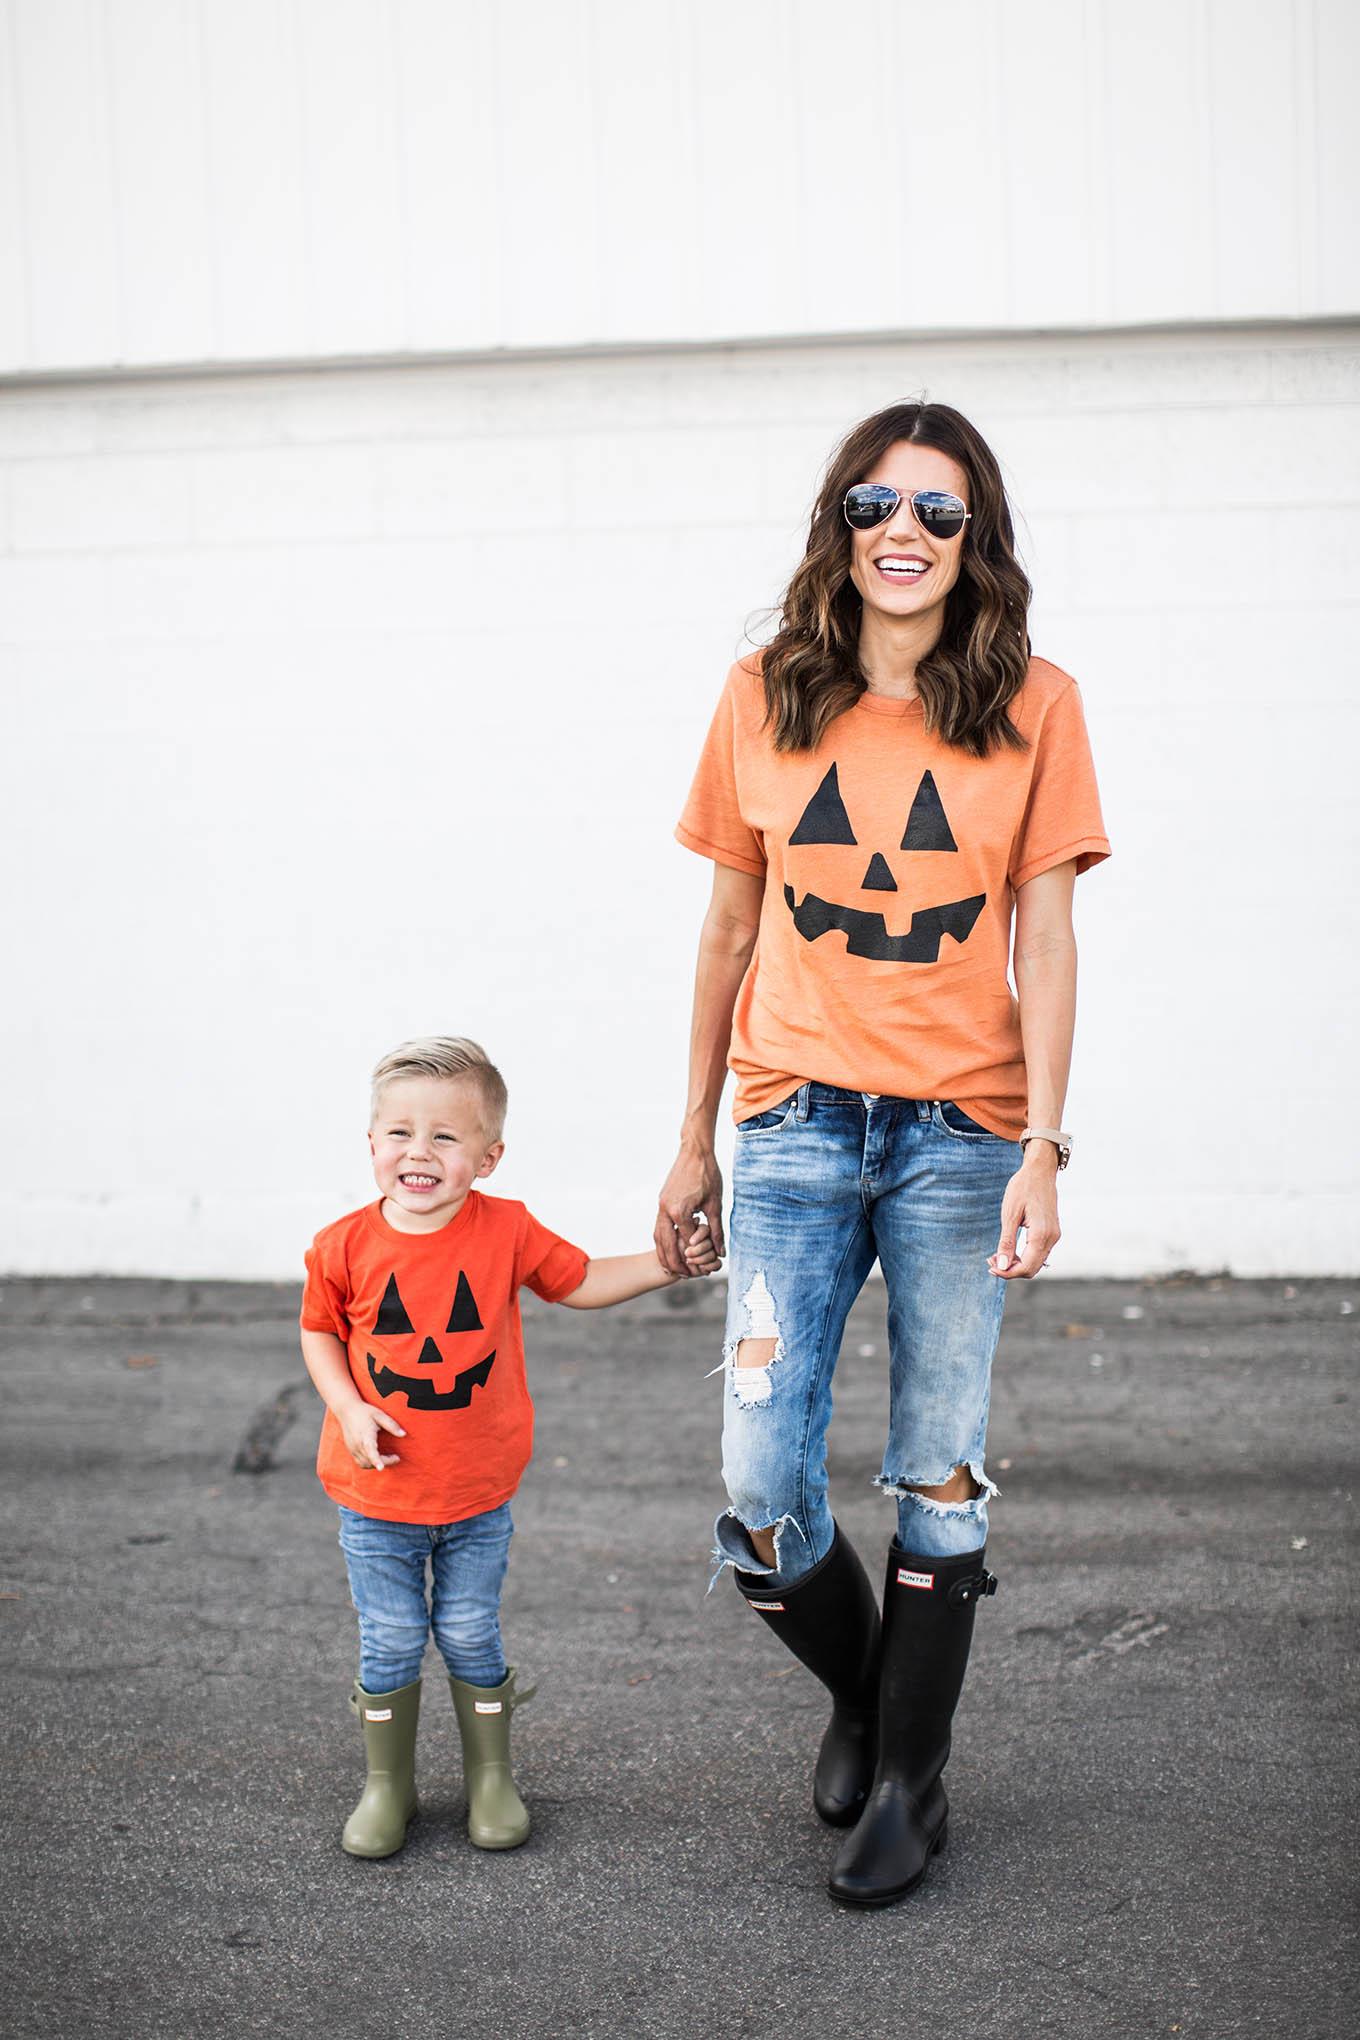 halloweenily